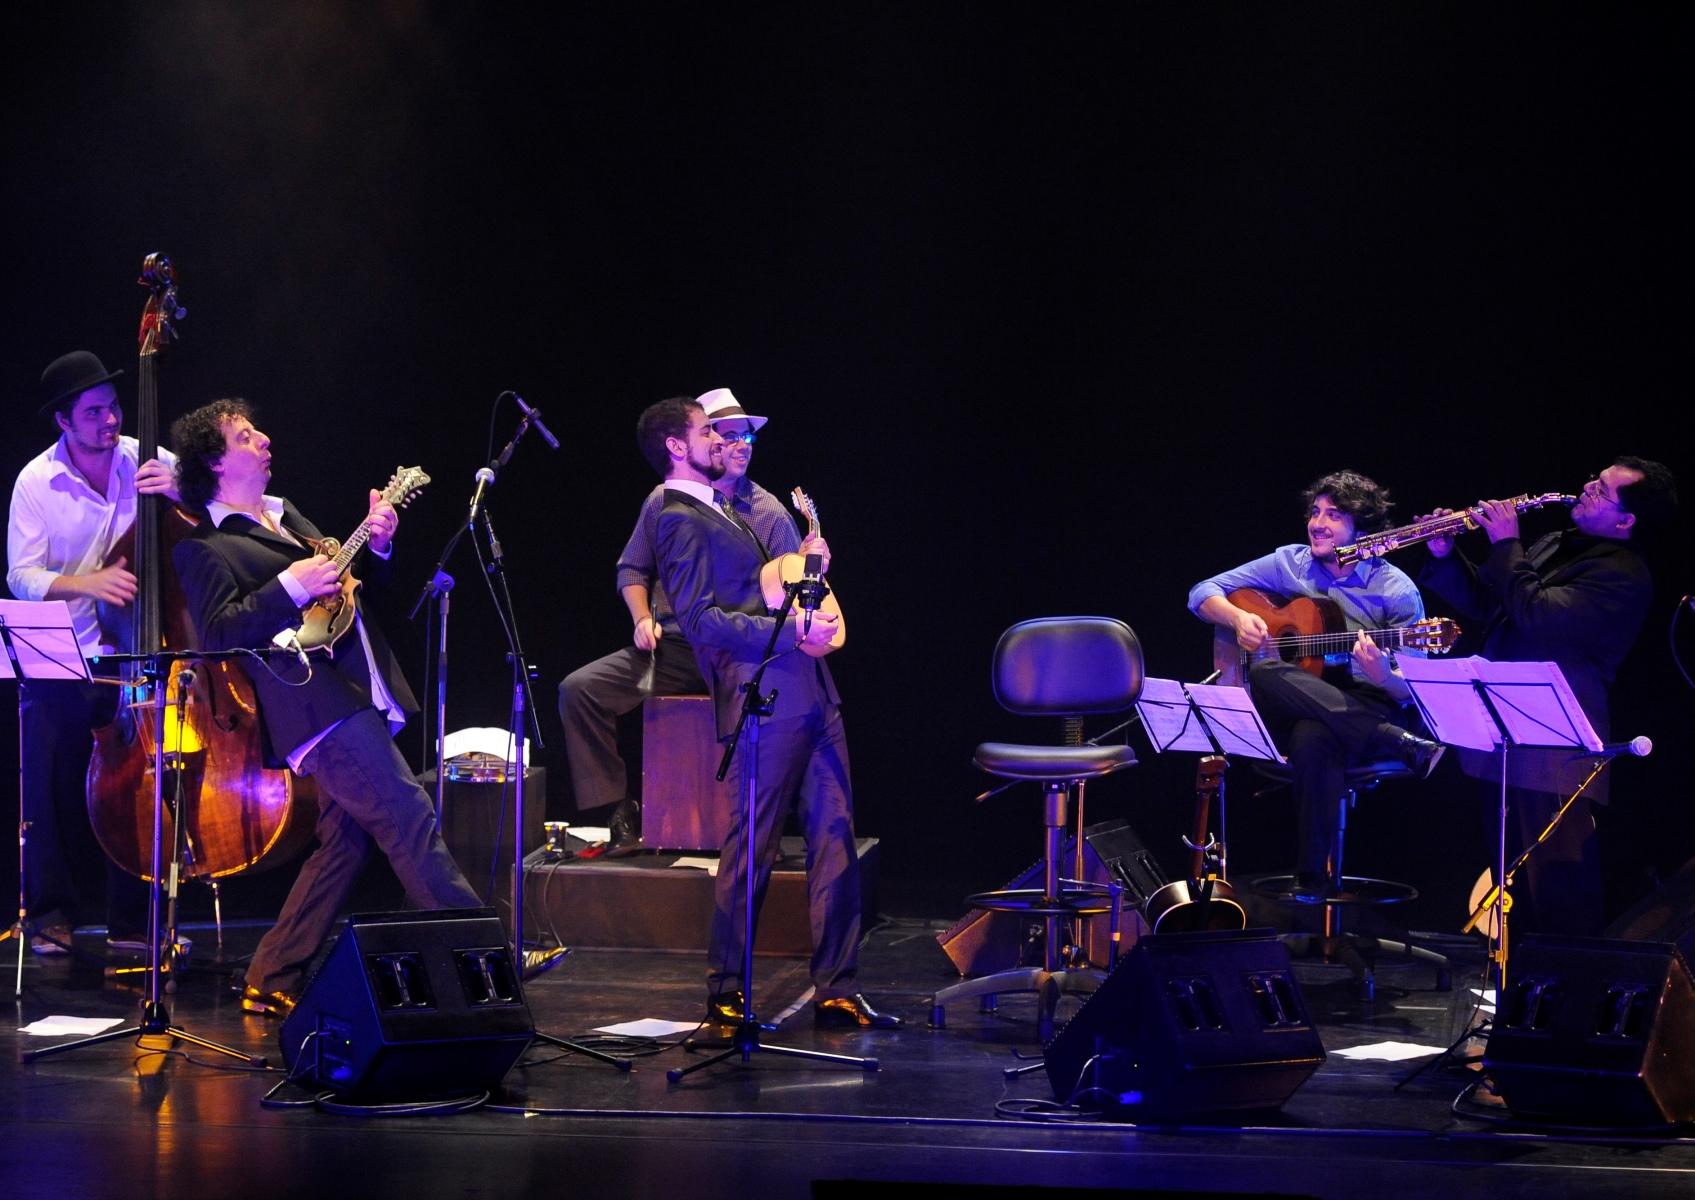 Auditório Ibirapuera, com Mike Marshall, Nailor Proveta, Guto Wirtti, João Camarero e Rafael Toledo